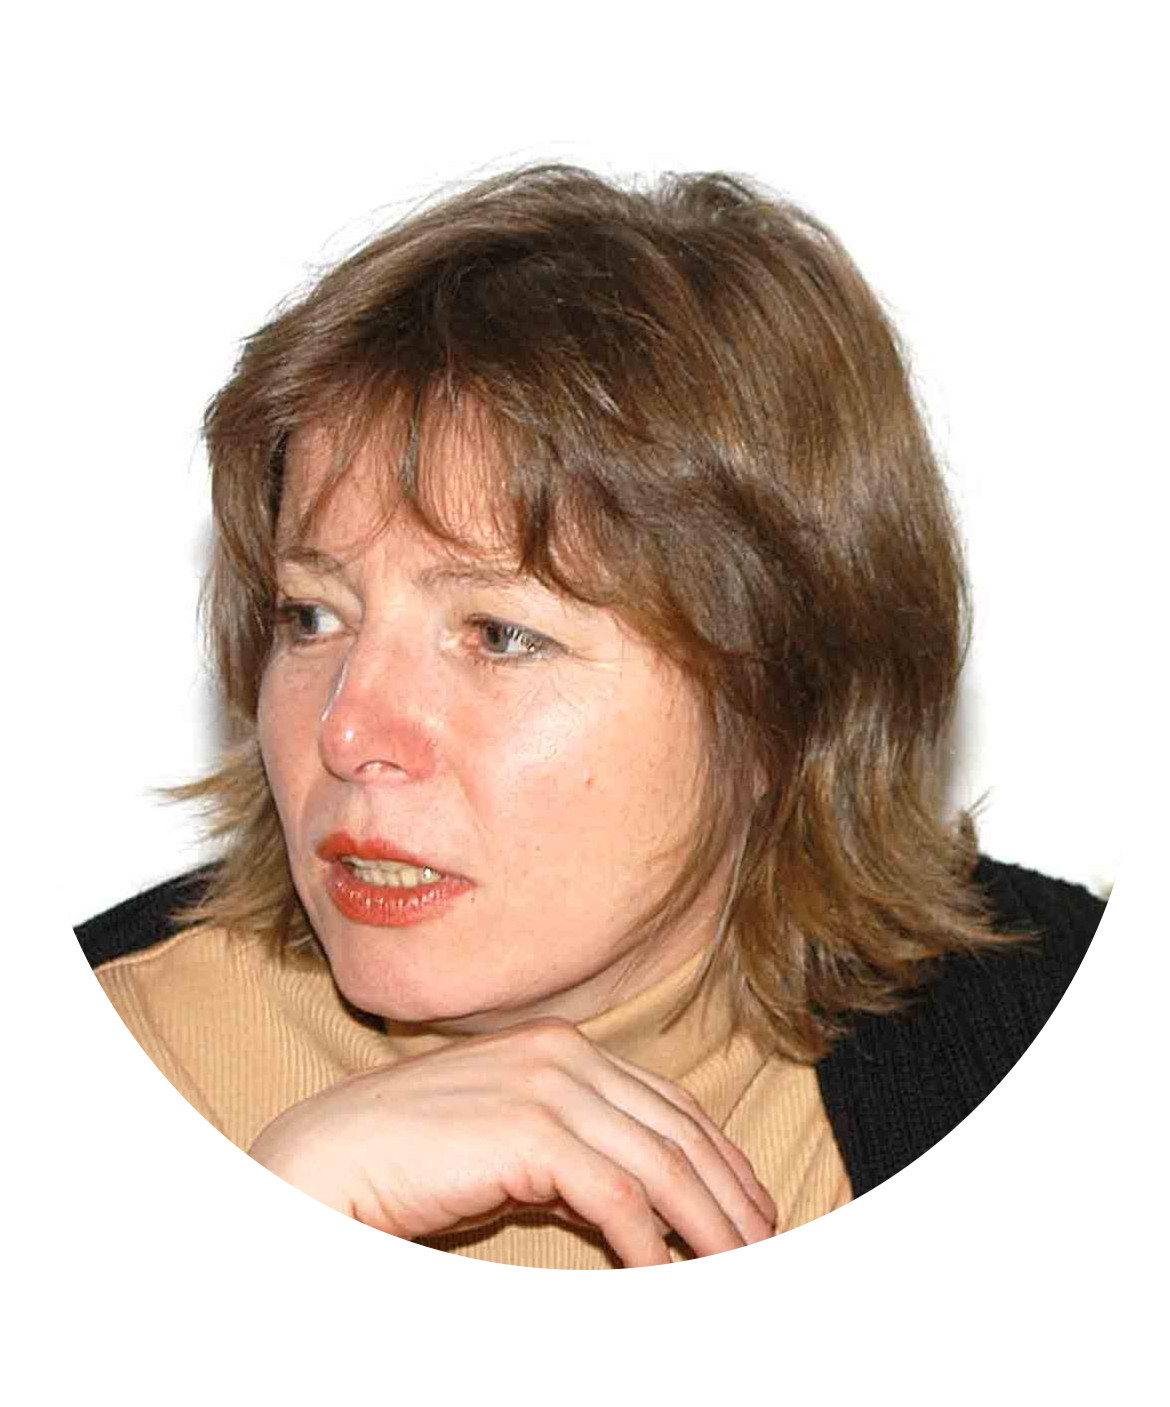 Sonia Hruschka